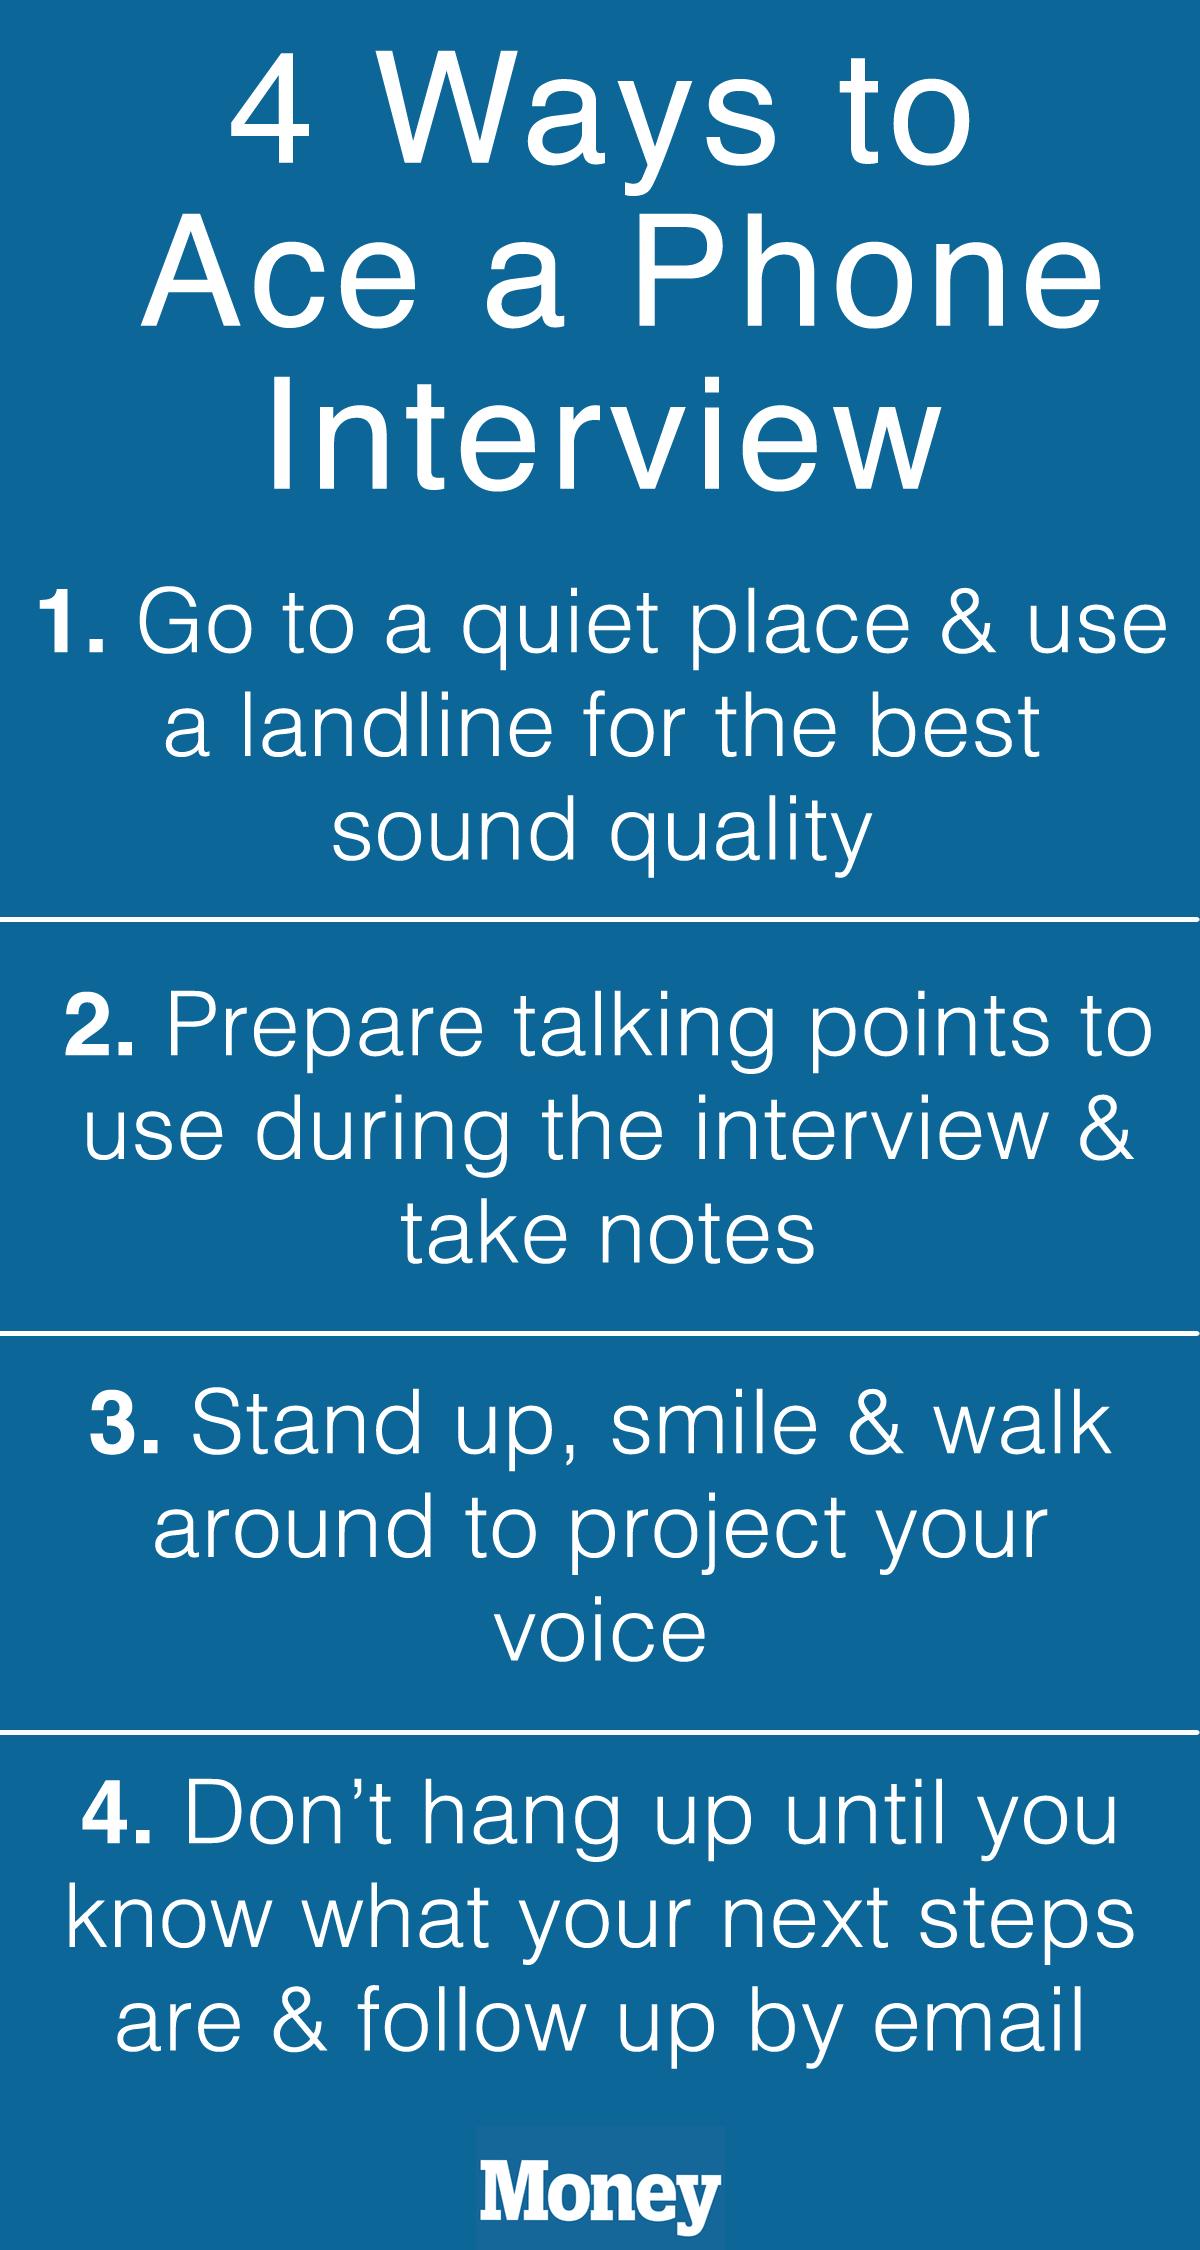 liczba obraz oacute w na temat interview job tips na pintere cie  liczba obrazoacutew na temat interview job tips na pintere347cie 17 najlepszych